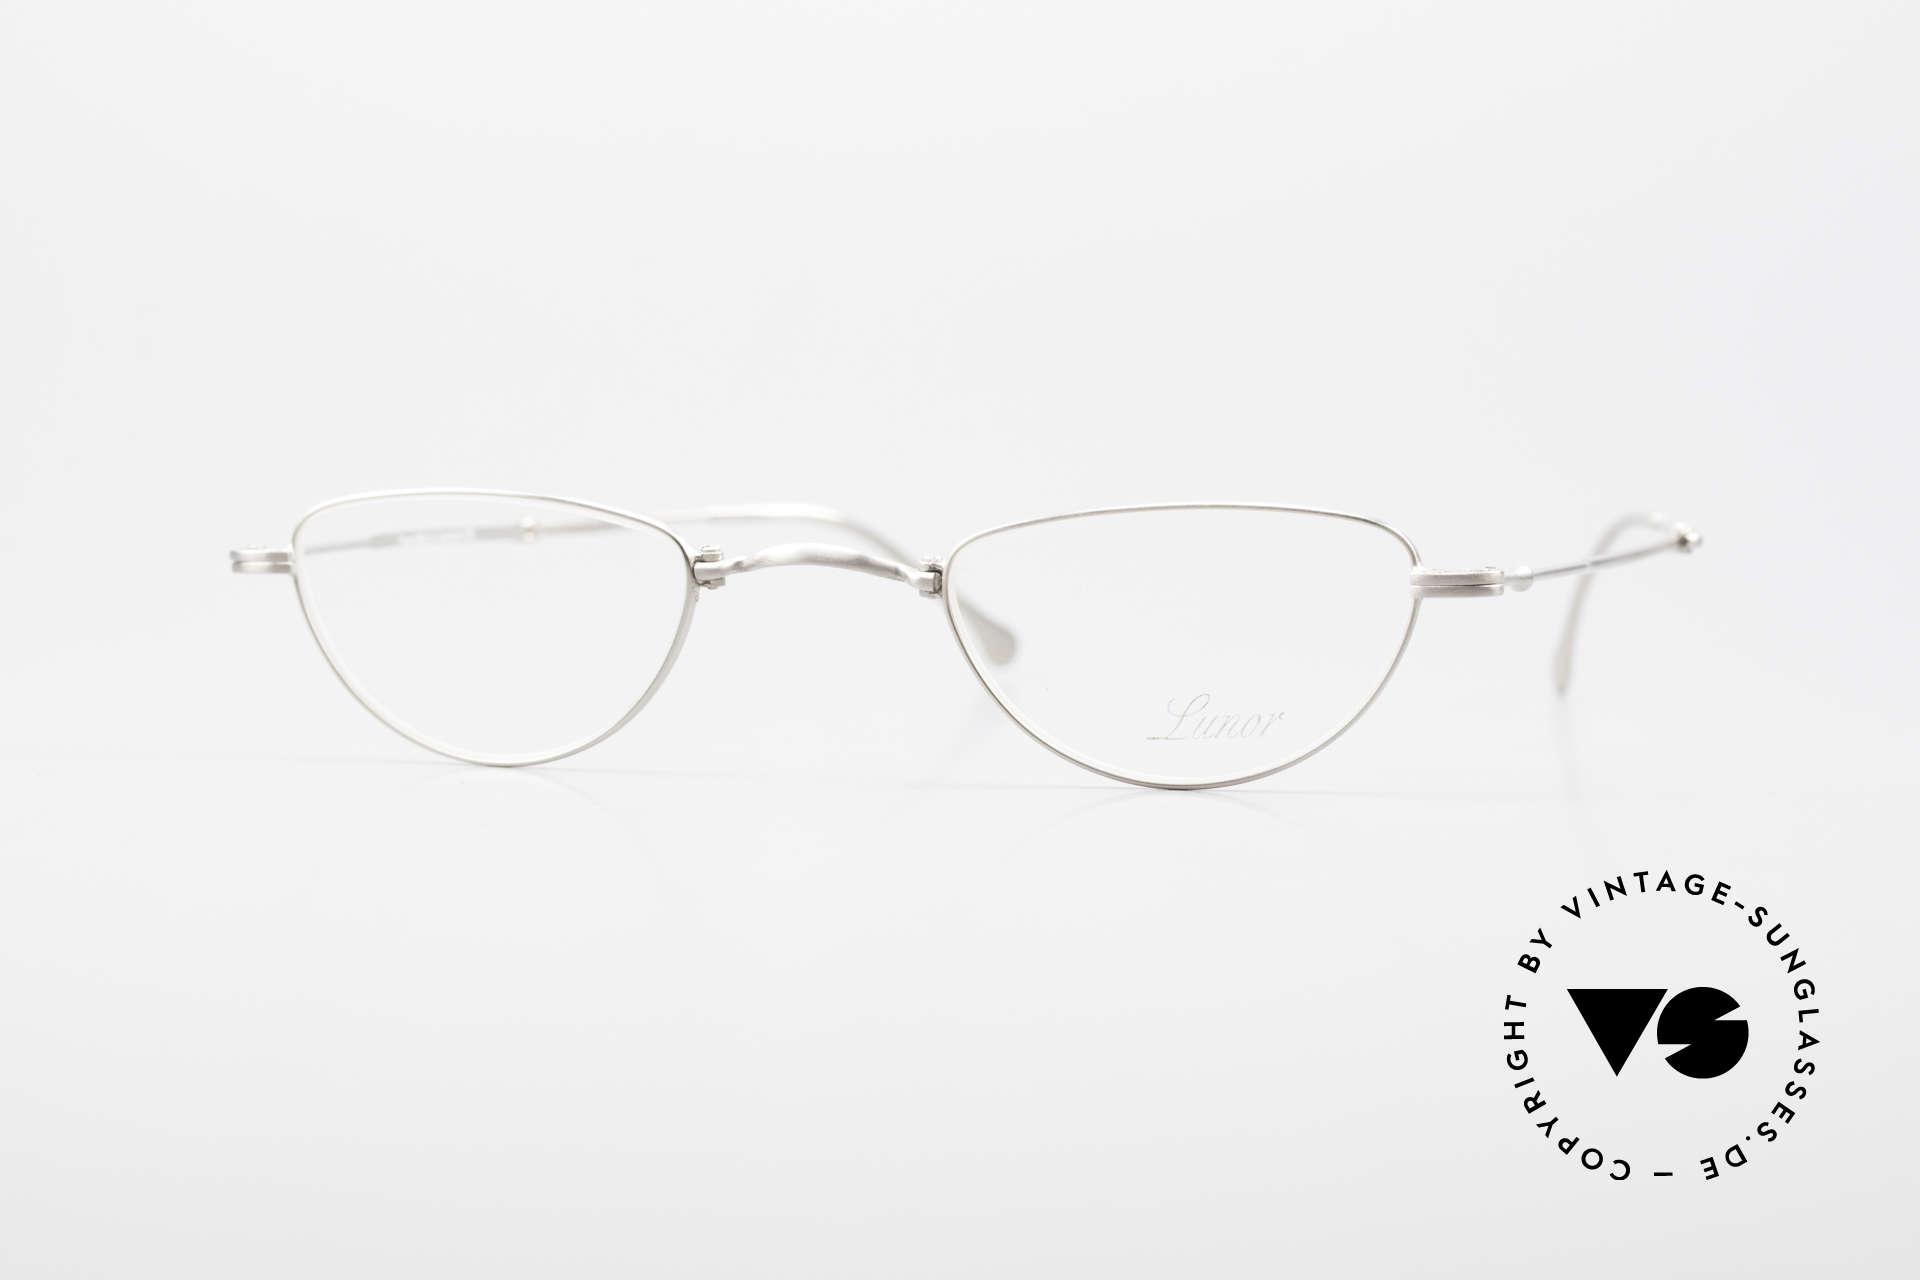 Lunor XXV Folding 06 Foldable Reading Eyeglasses, rare Lunor folding reading glasses XXV 06 in size 40/25, Made for Men and Women